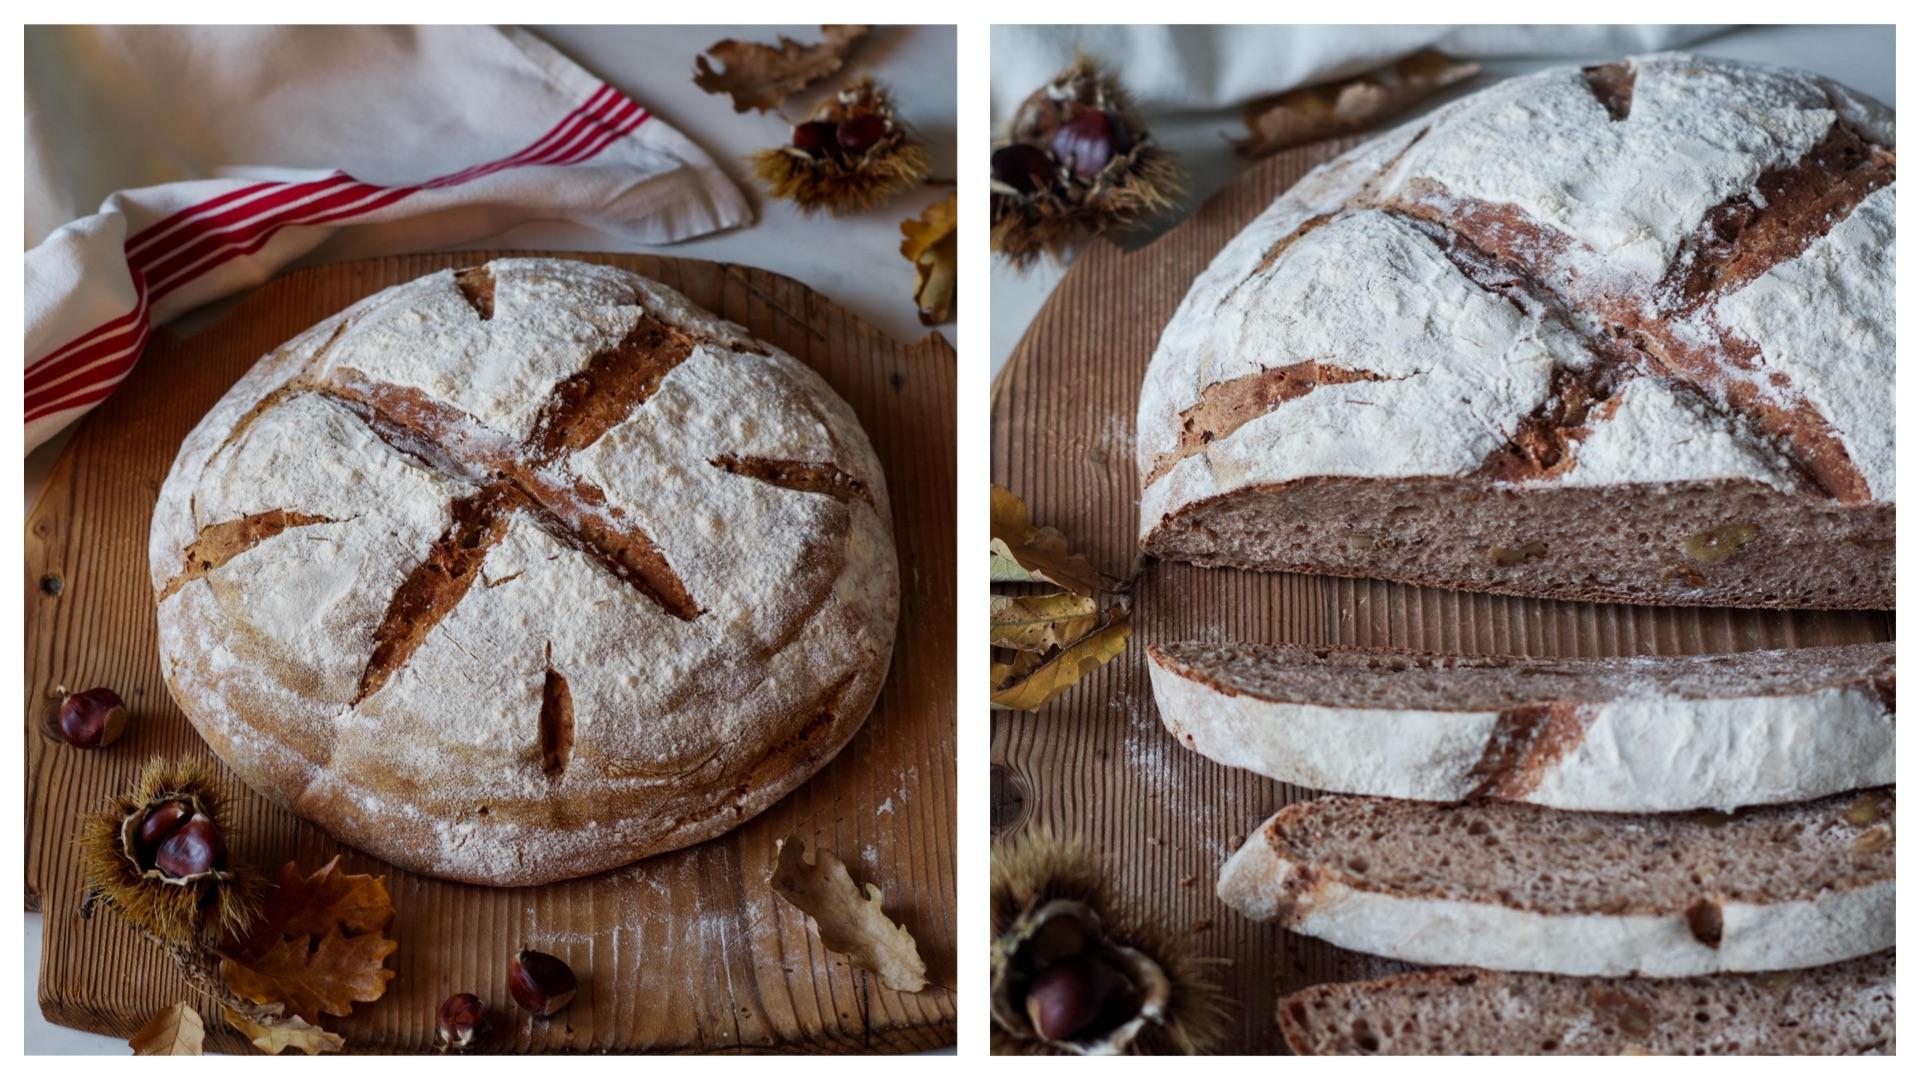 Italian Riviera Chestnut bread: recipe by asmallkitcheningenoa